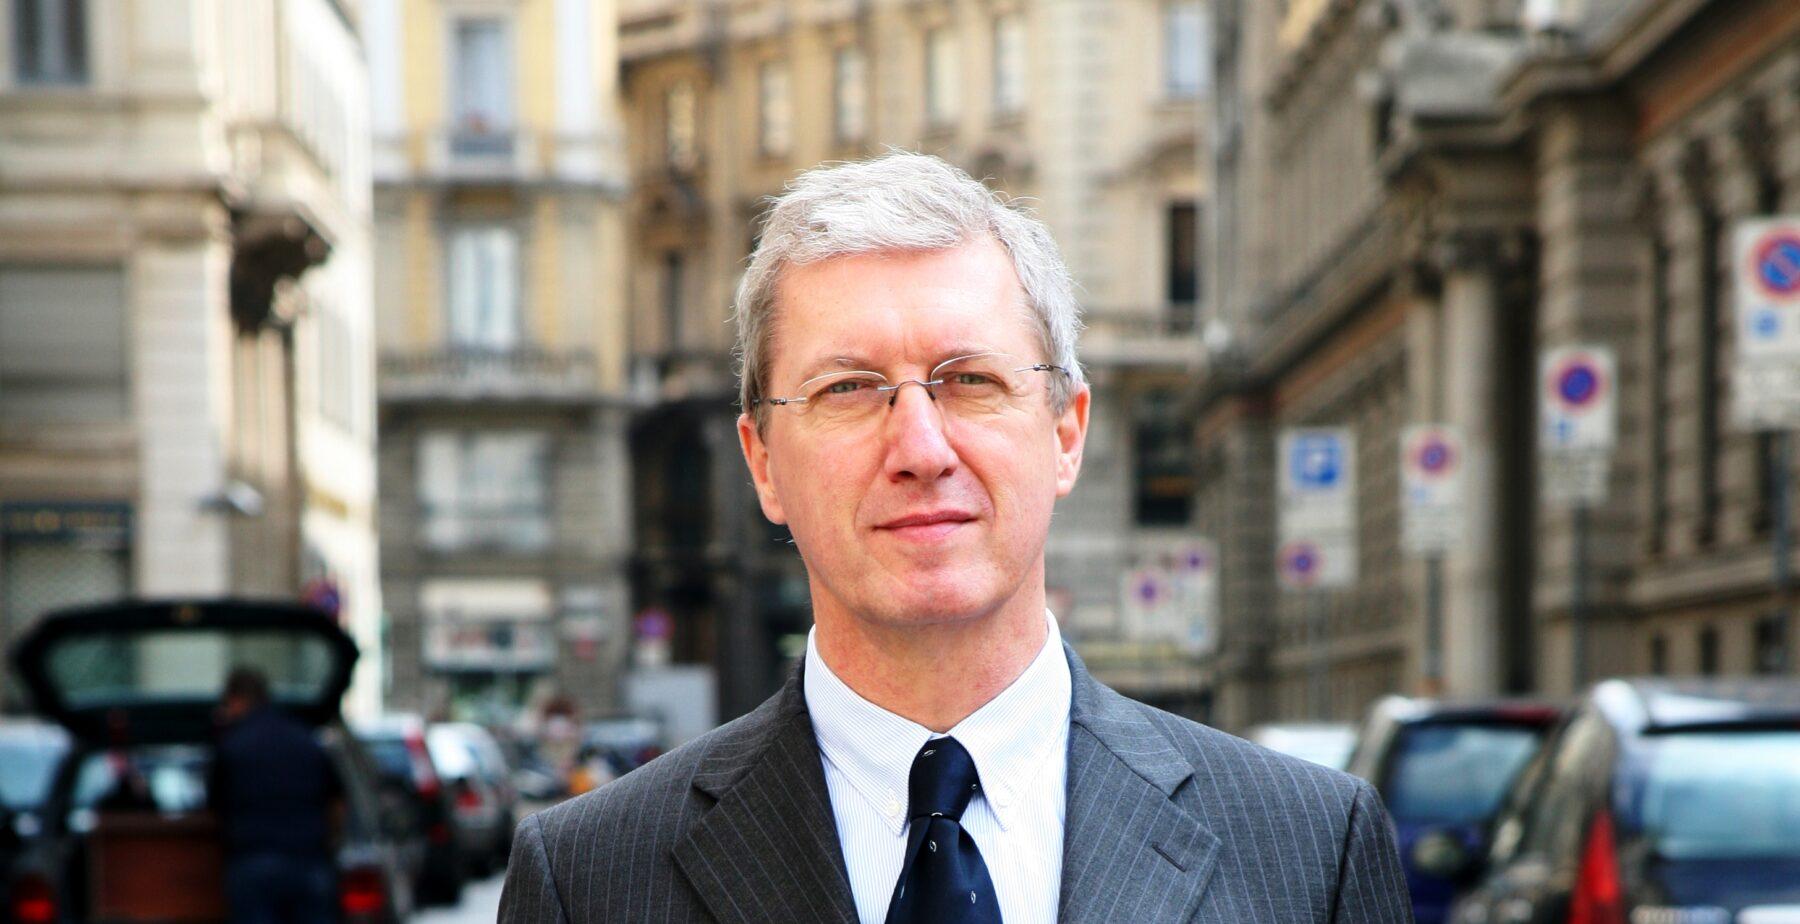 Roberto Biscardini